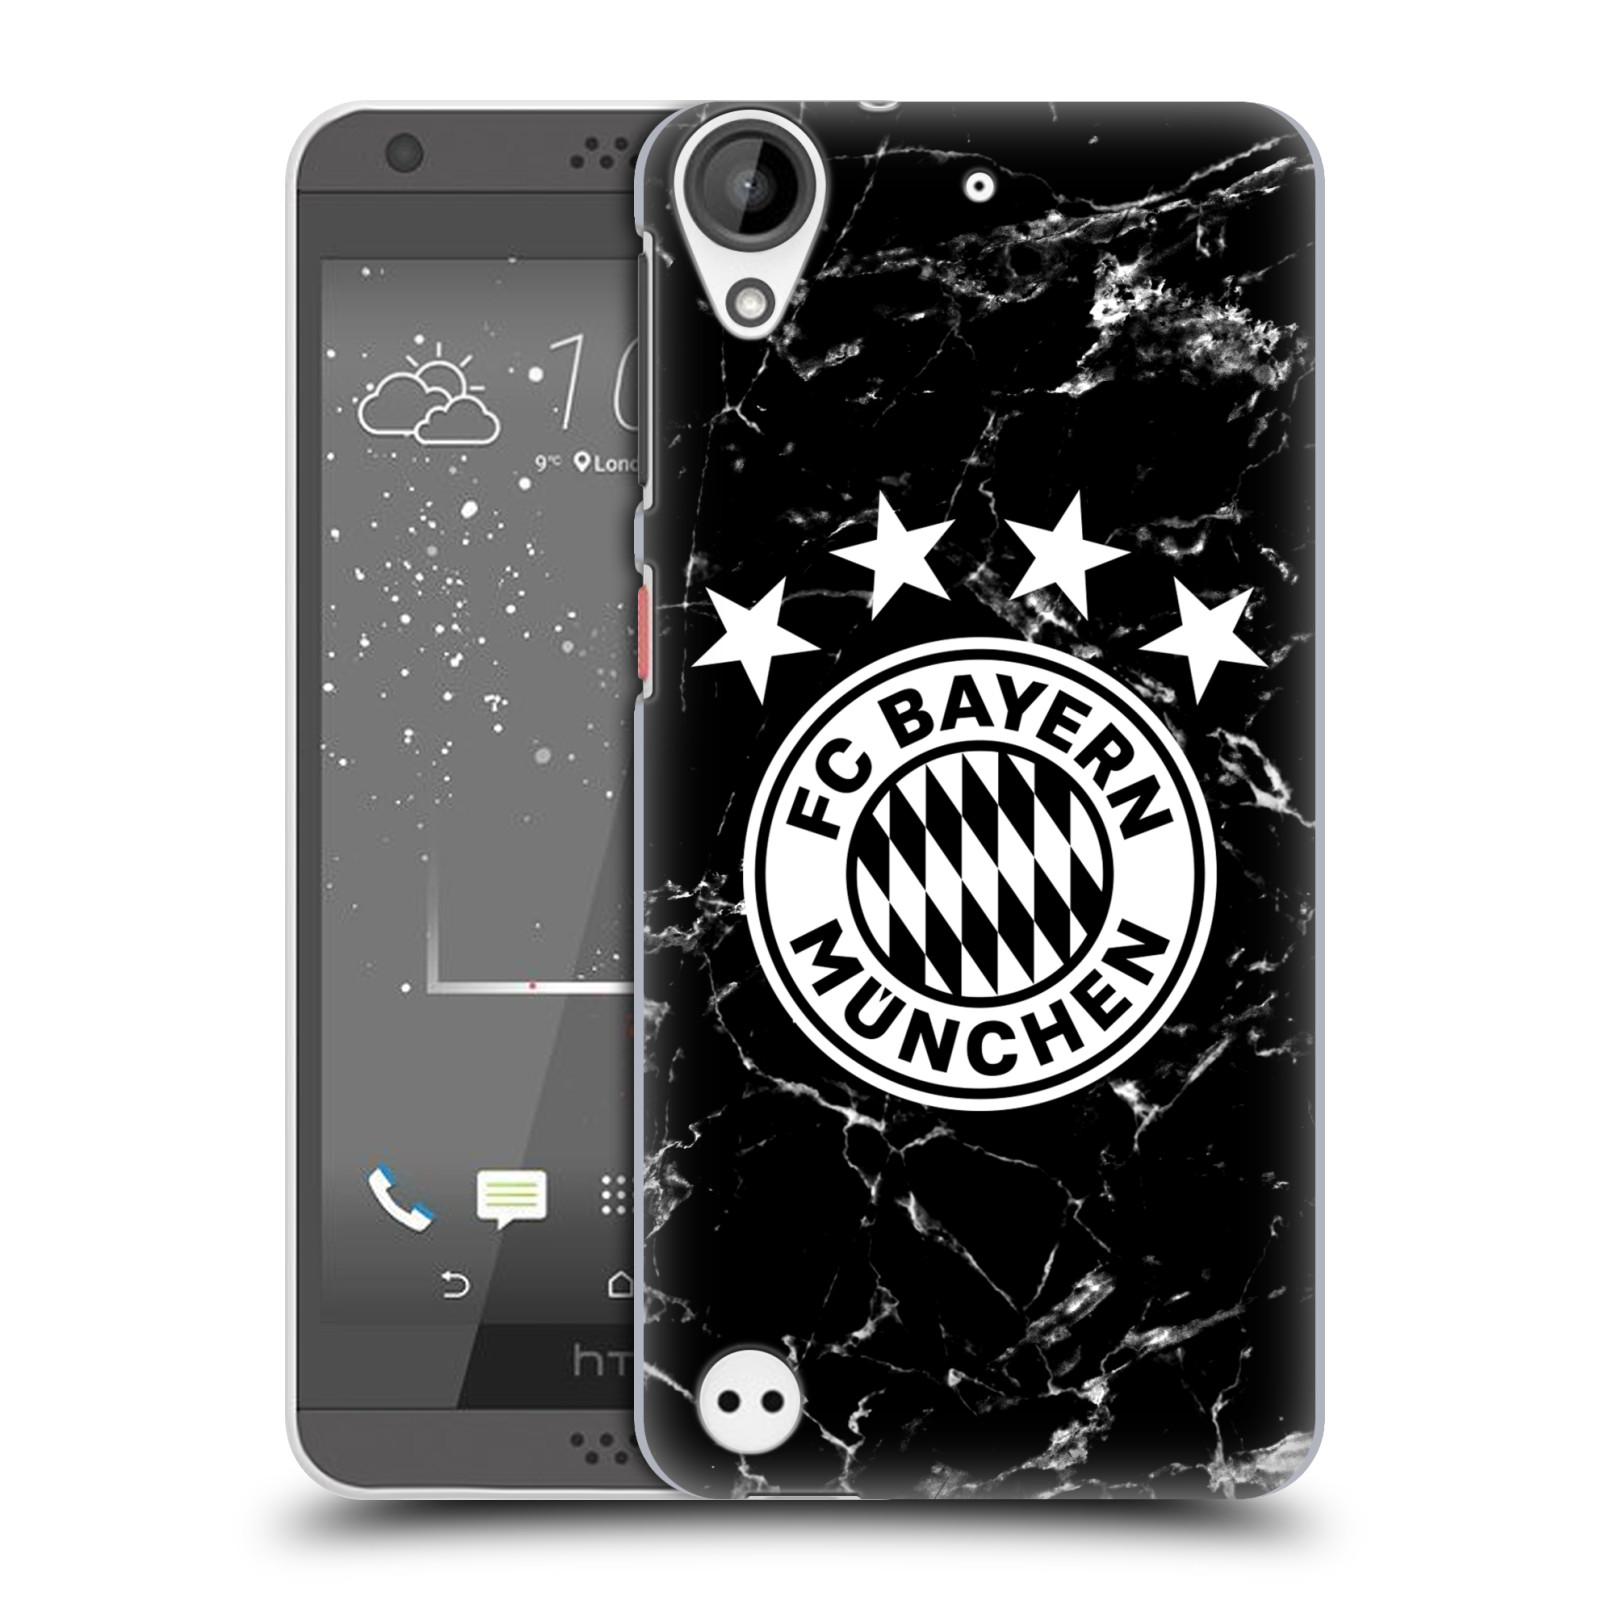 Plastové pouzdro na mobil HTC Desire 530 - Head Case - FC Bayern Mnichov - Logo mramor